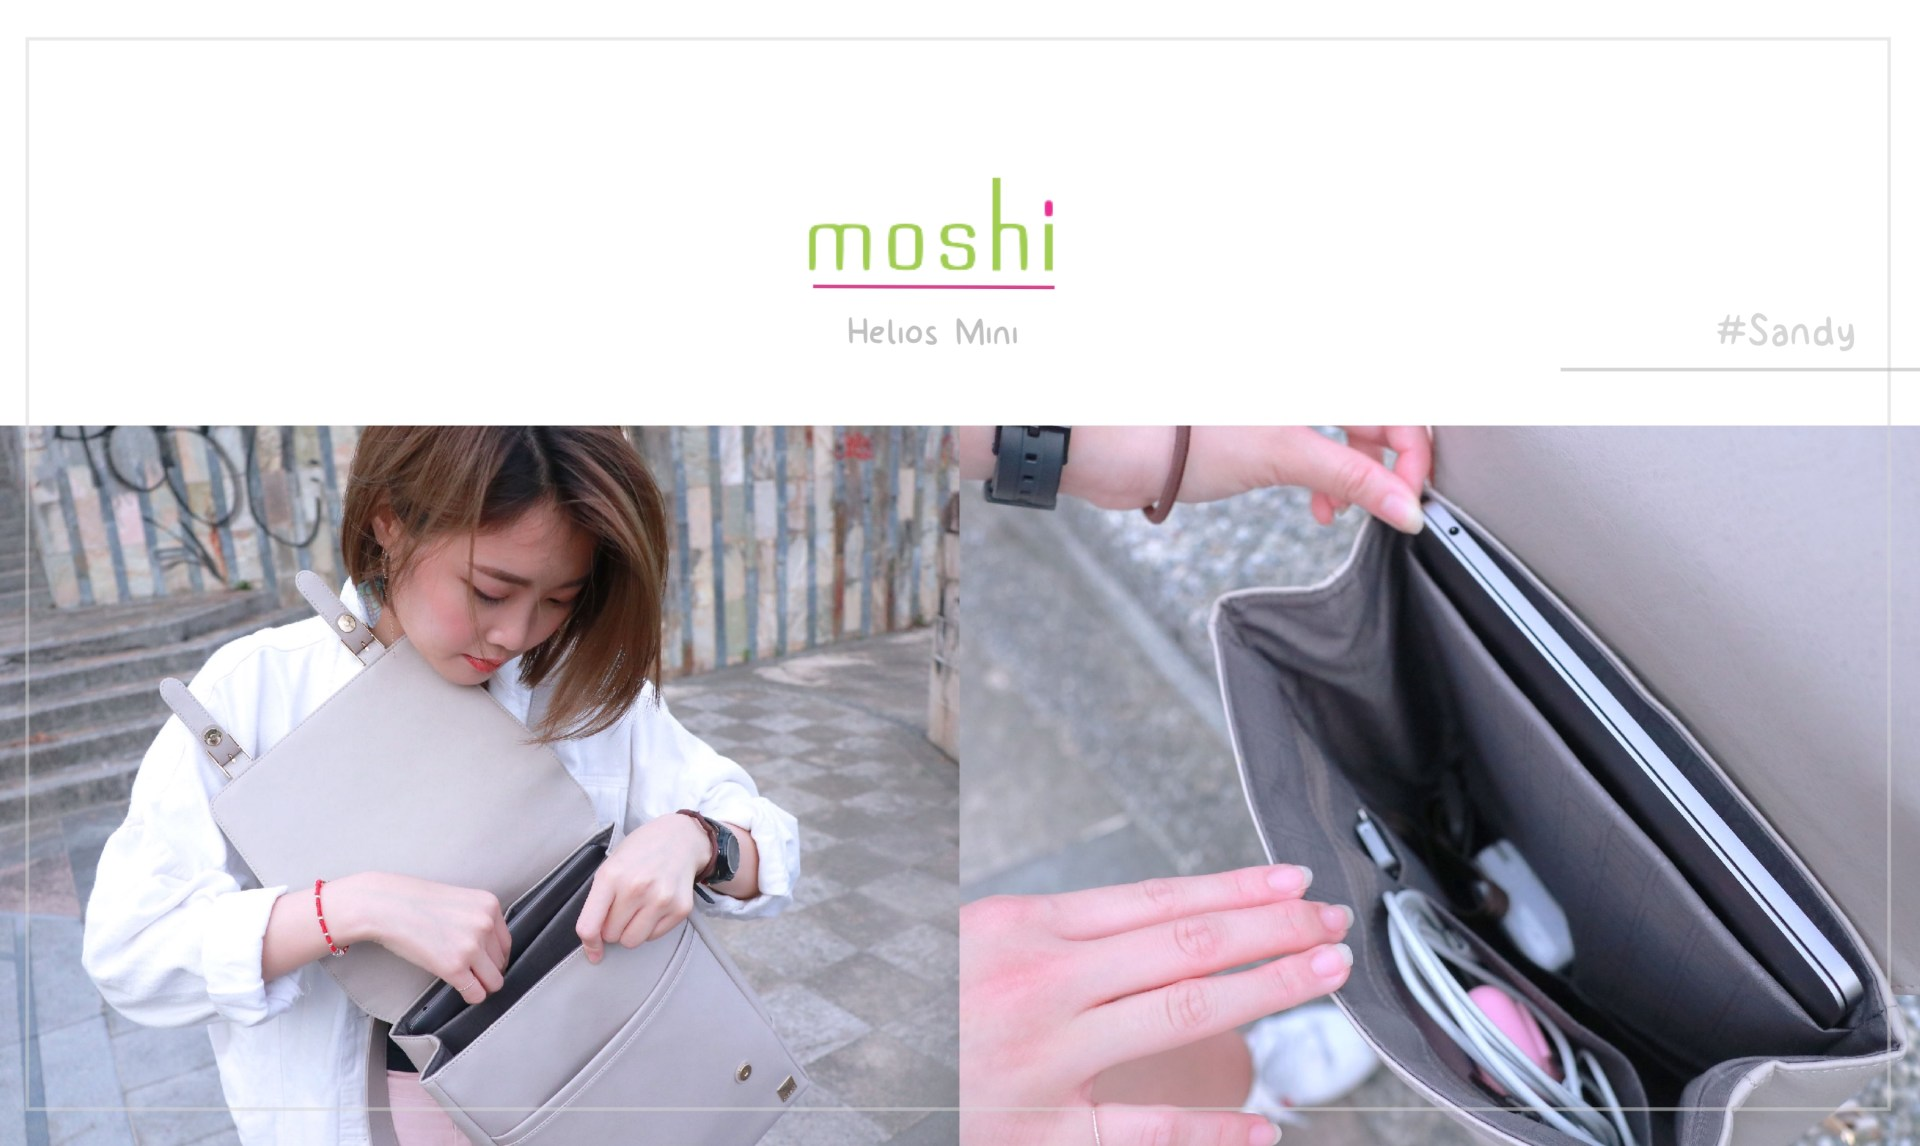 moshi helios mini 時尚雙肩迷你後背包使用情境